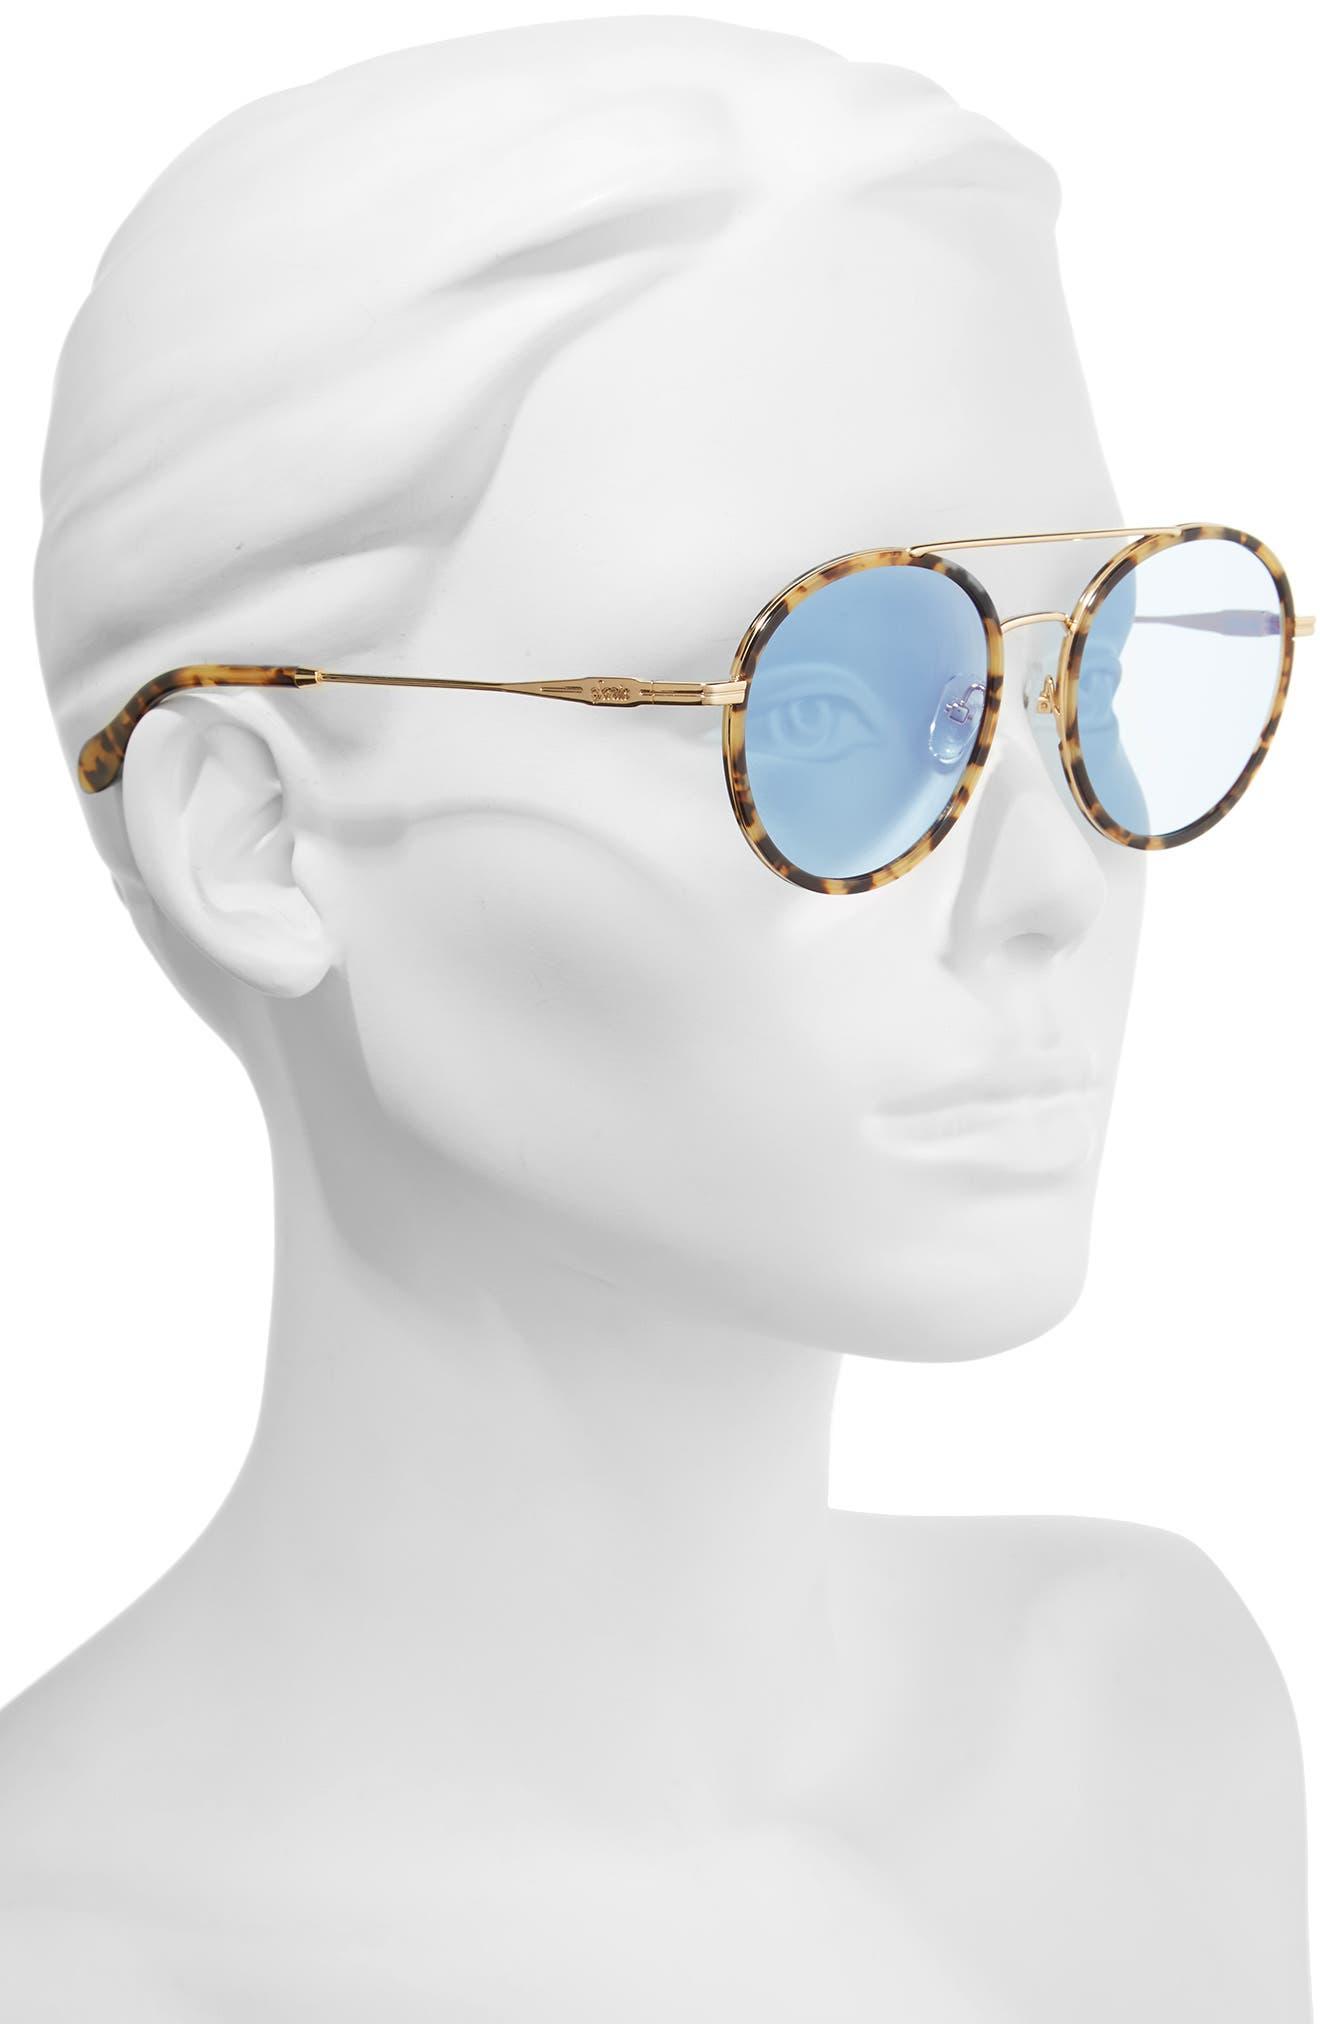 Charli 50mm Mirrored Lens Round Sunglasses,                             Alternate thumbnail 6, color,